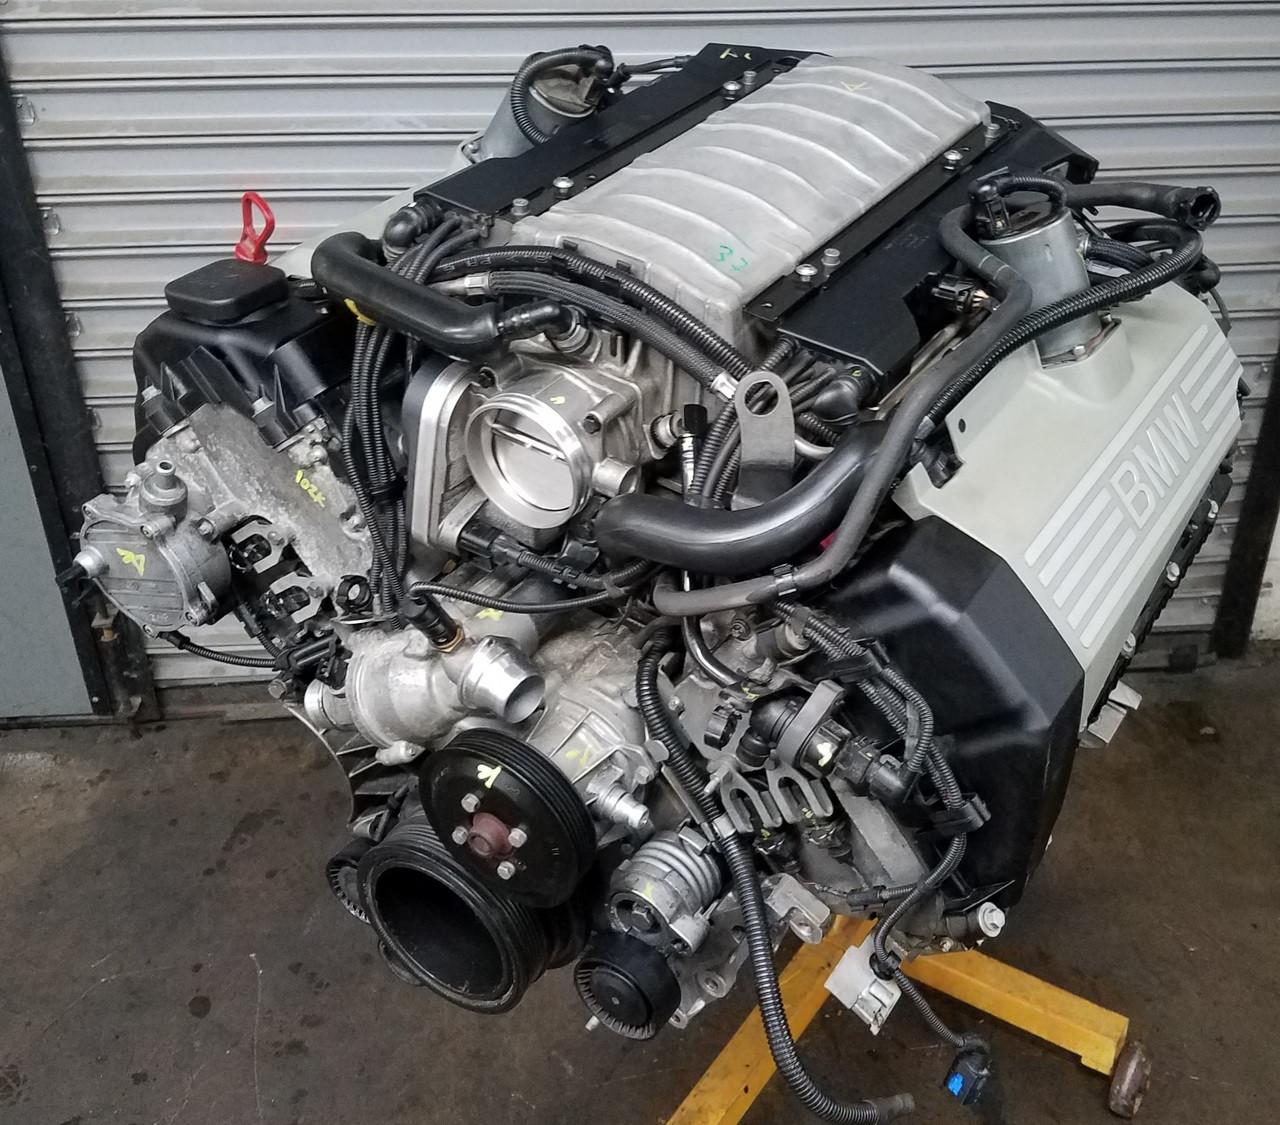 BMW N62 4.4 Engine Long Block Motor E53 E60 E65 X5 545 745 ...